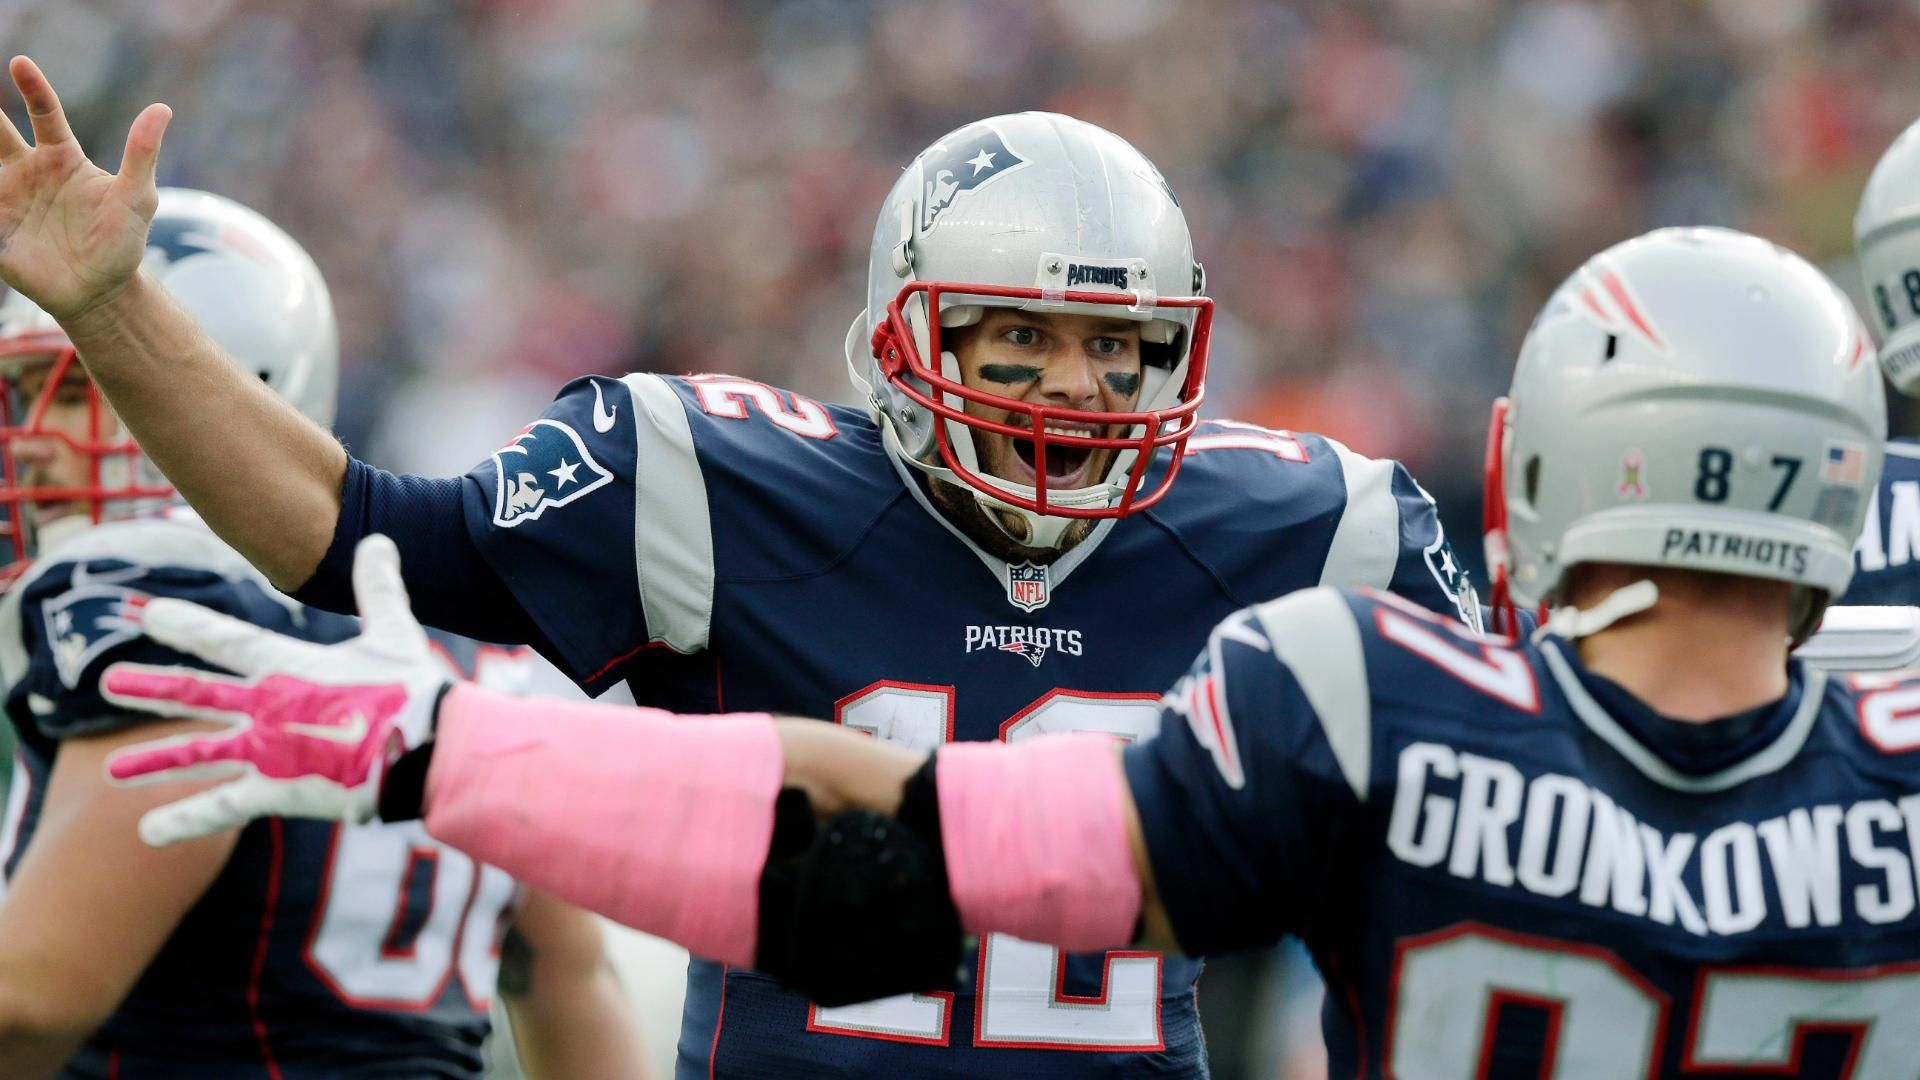 super popular 46384 77fd7 Brandon Marshall takes blame for Jets' loss to Patriots ...